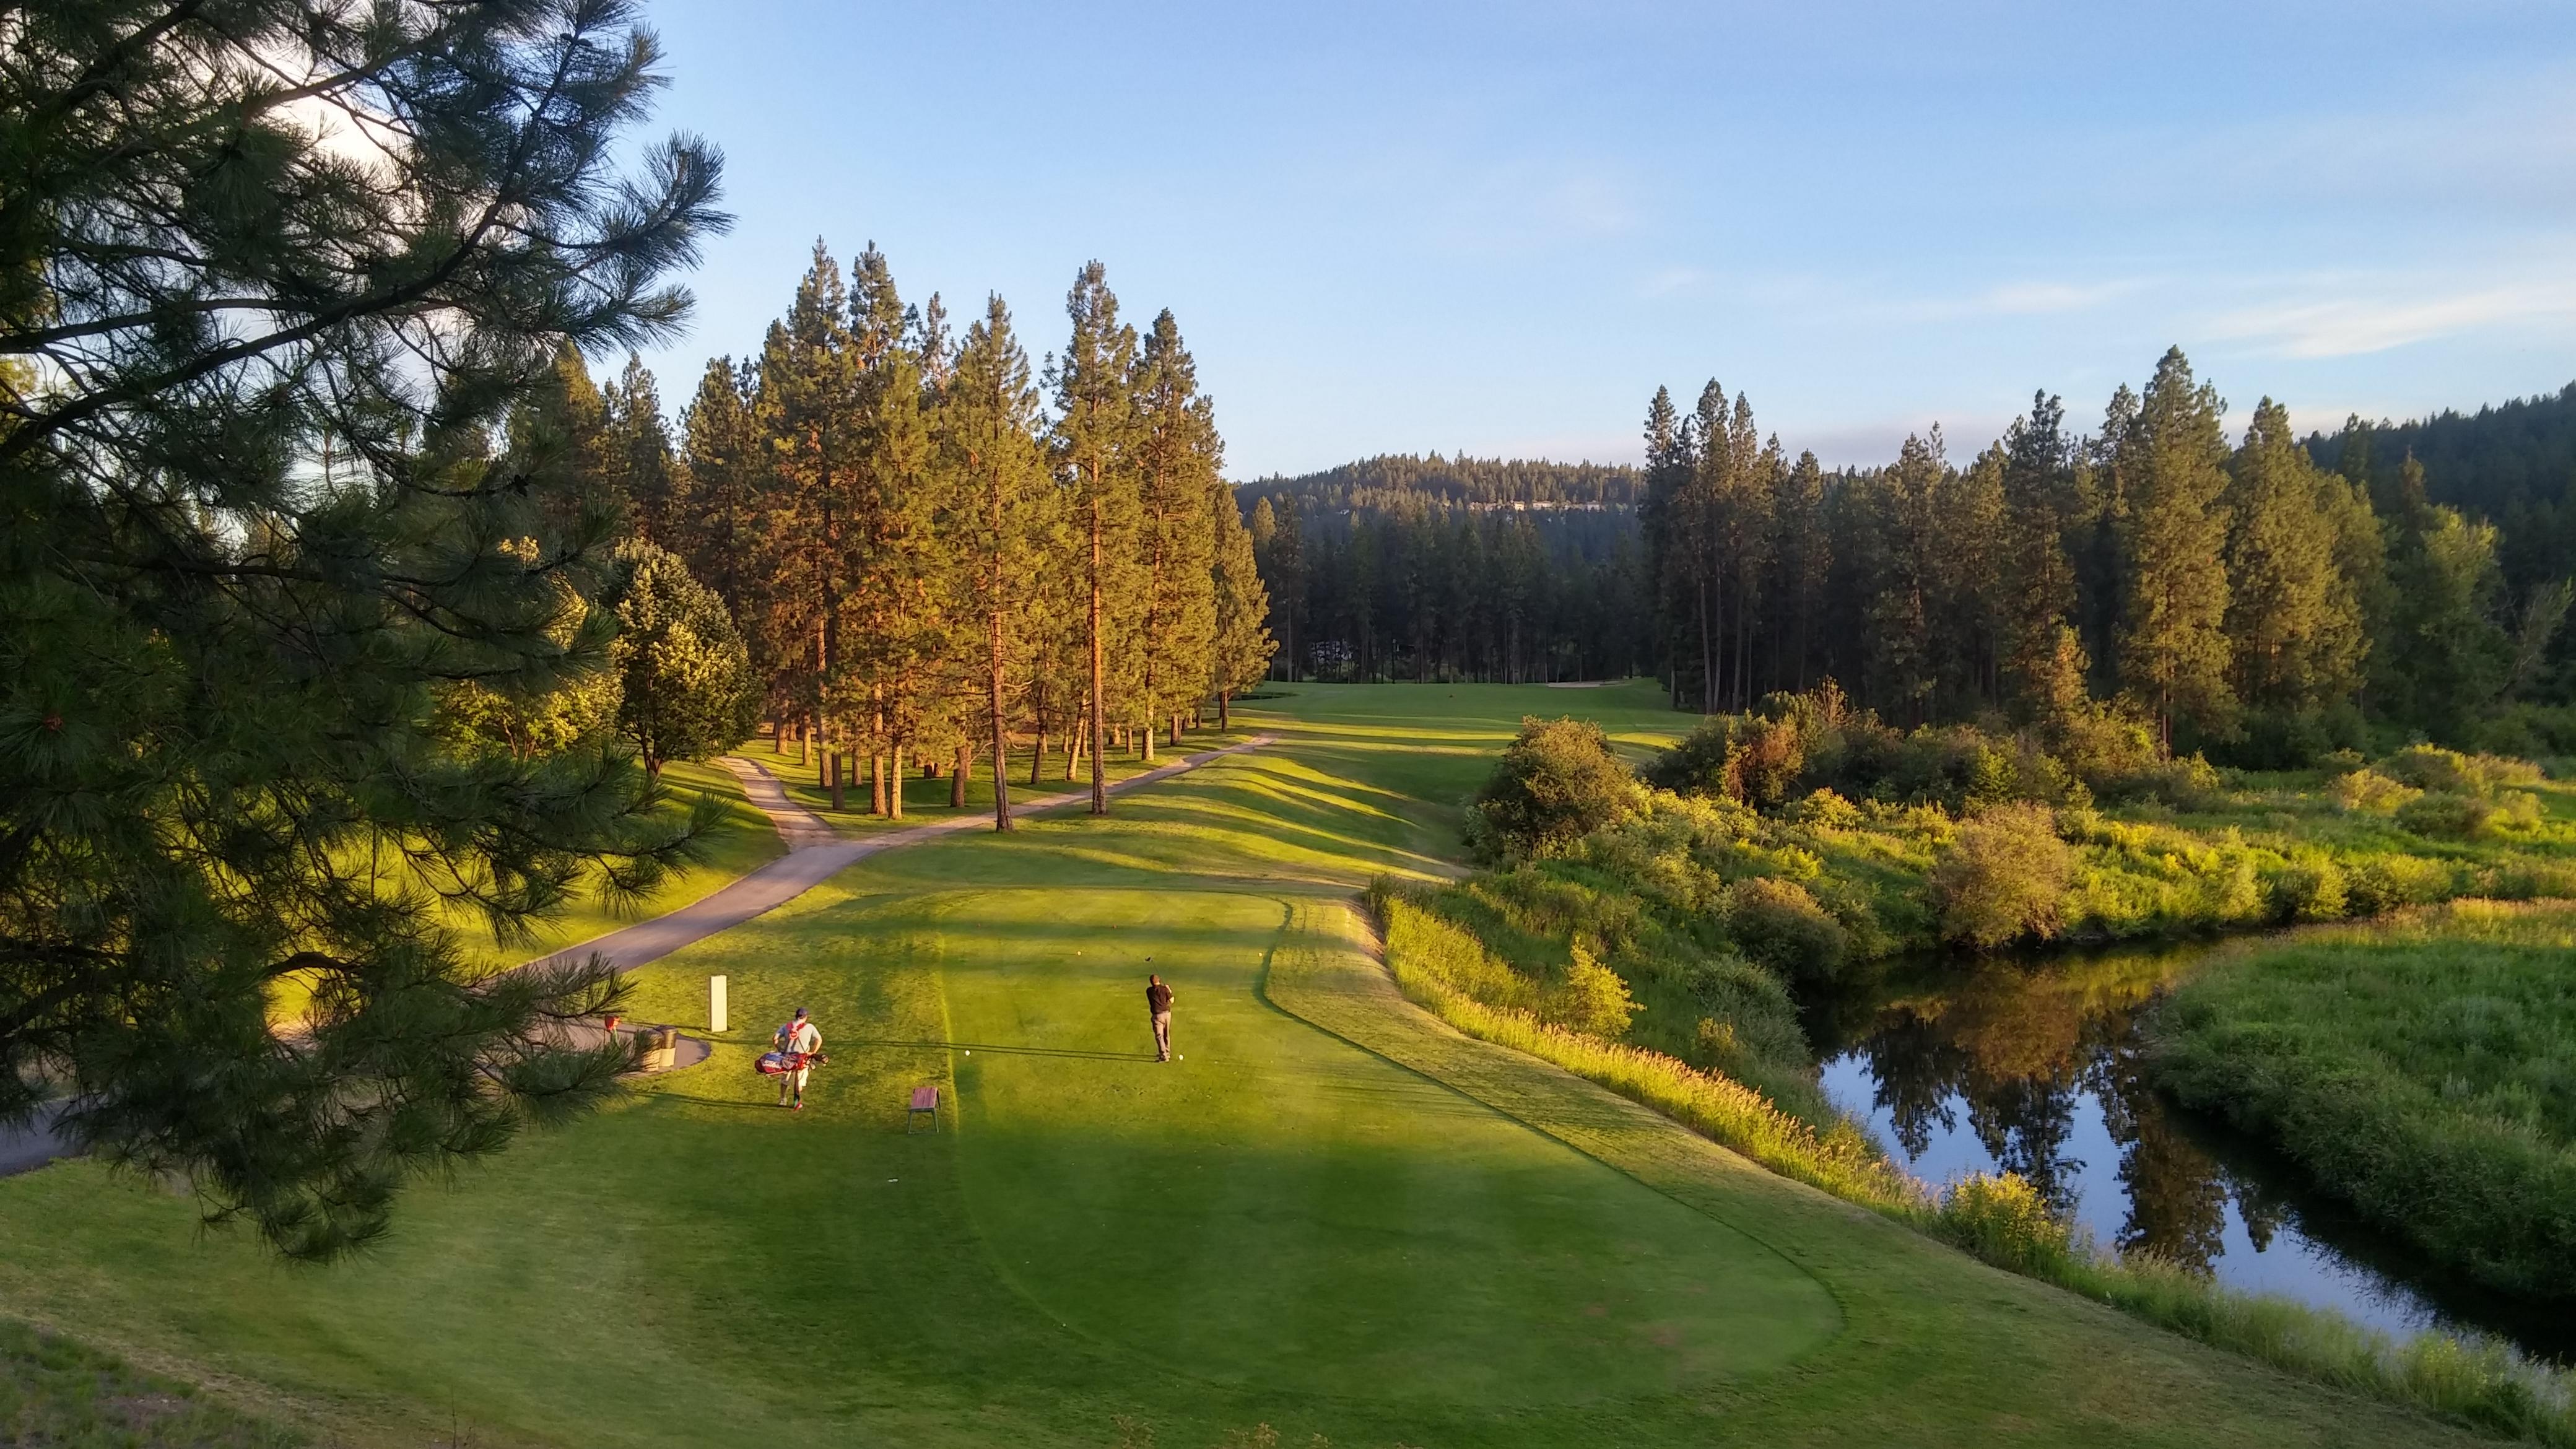 AIA|CSI 2018 Golf Tournament gallery image #1